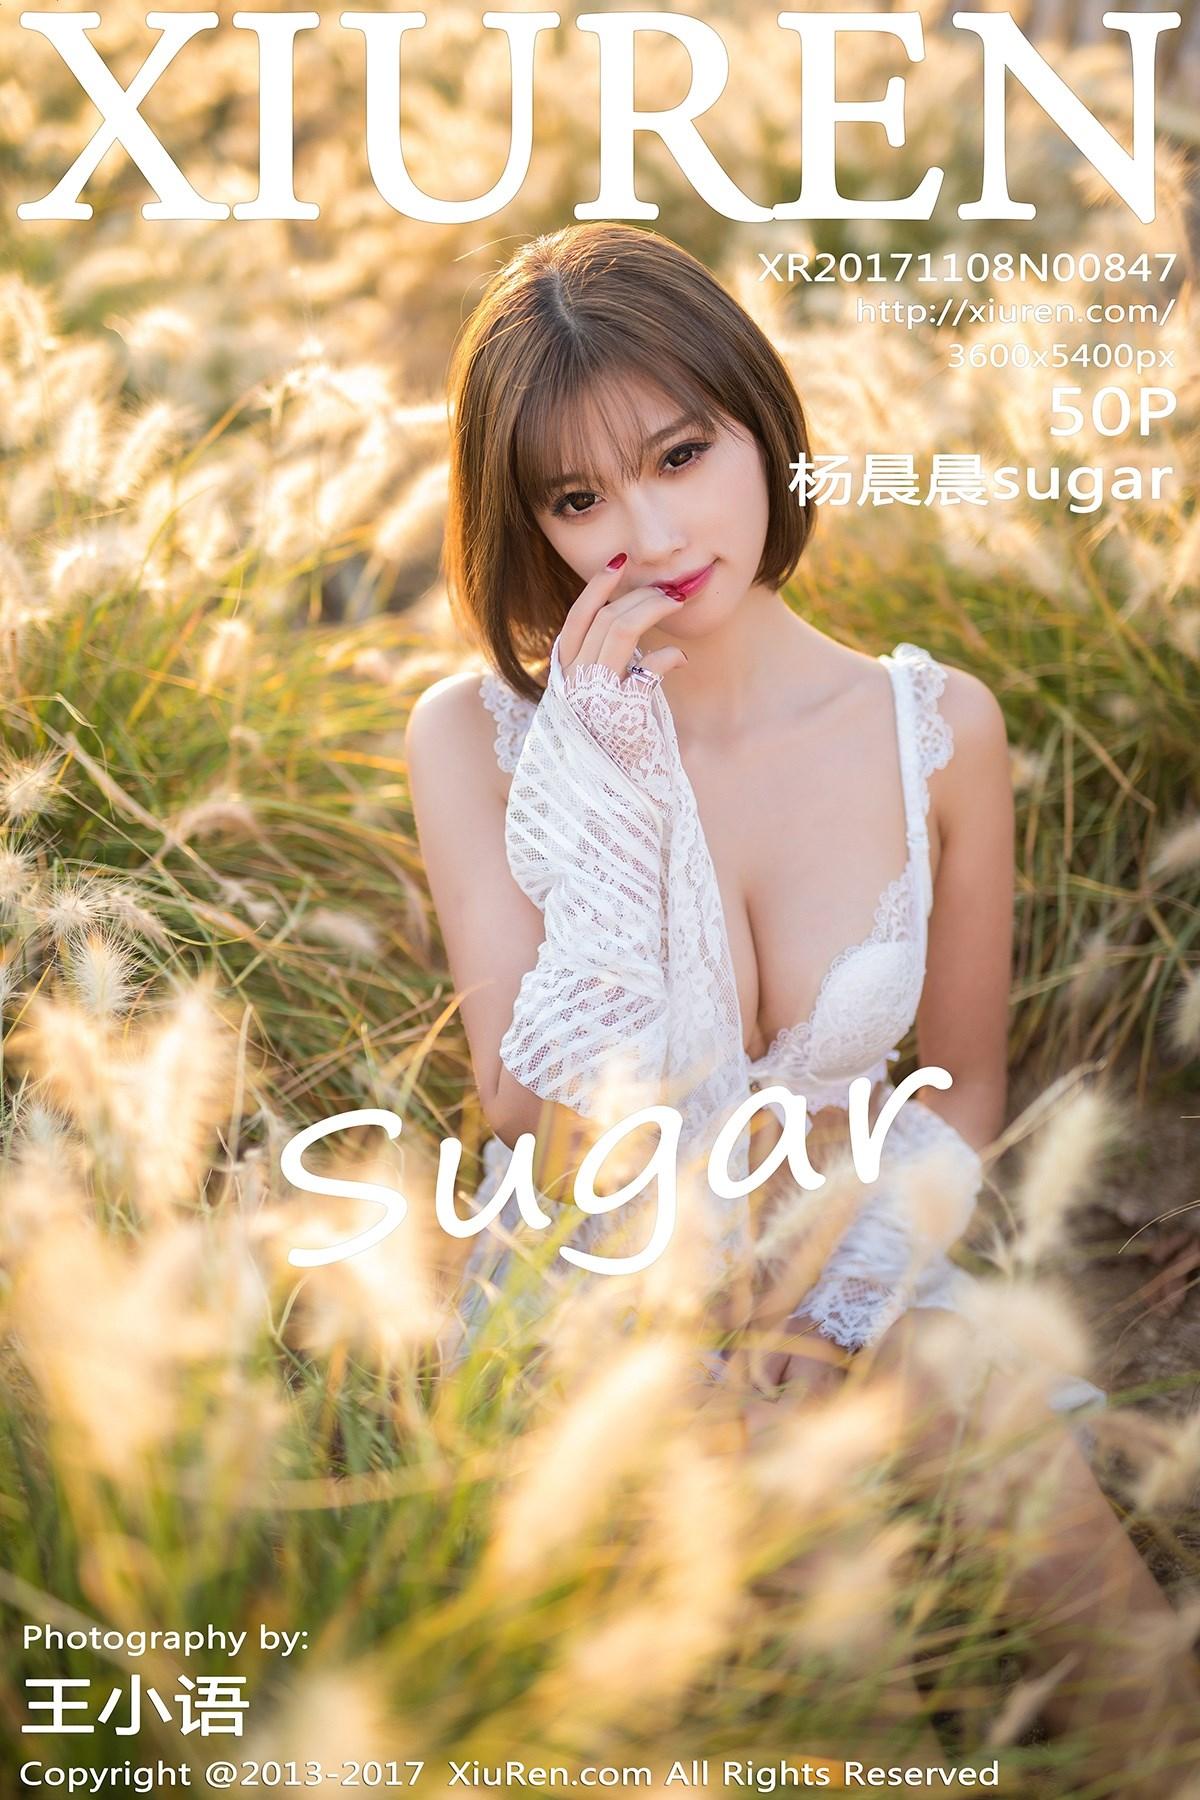 【Xiuren秀人網】No.847 楊晨晨sugar  性感寫真 - 貼圖 - 清涼寫真 -